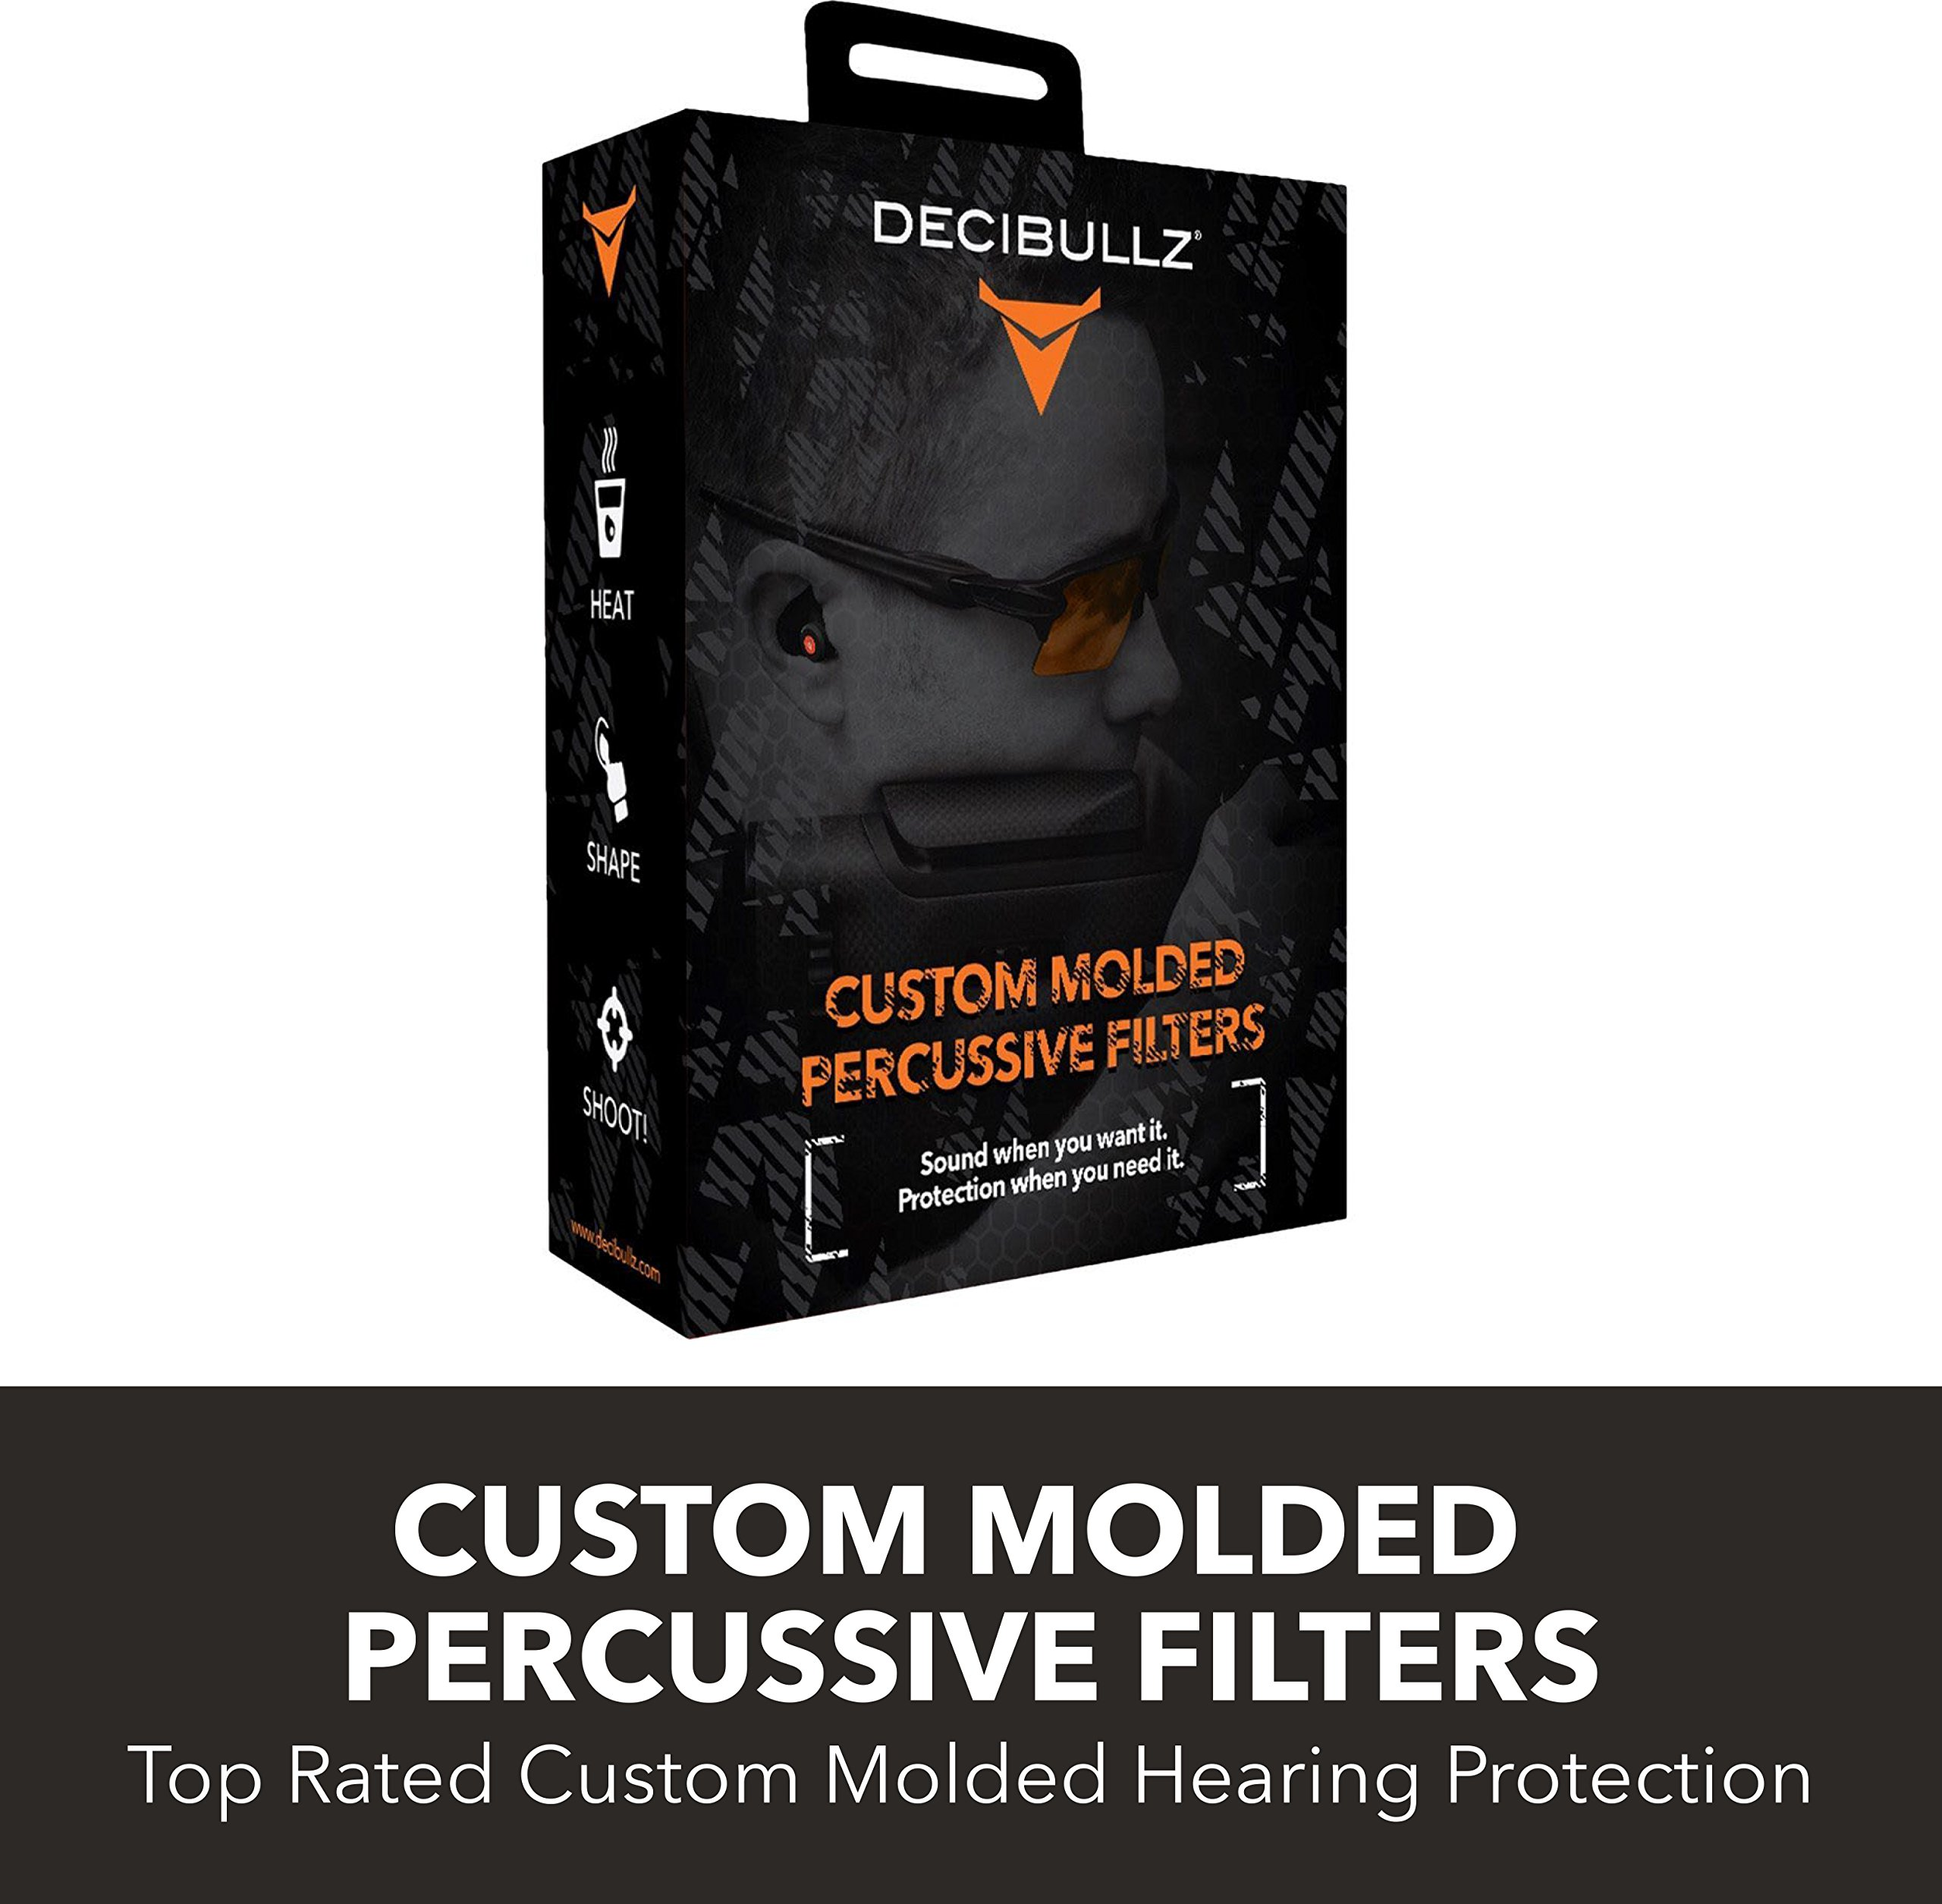 Decibullz - Custom Molded Percussive Filters, Custom Molded Hearing Protection